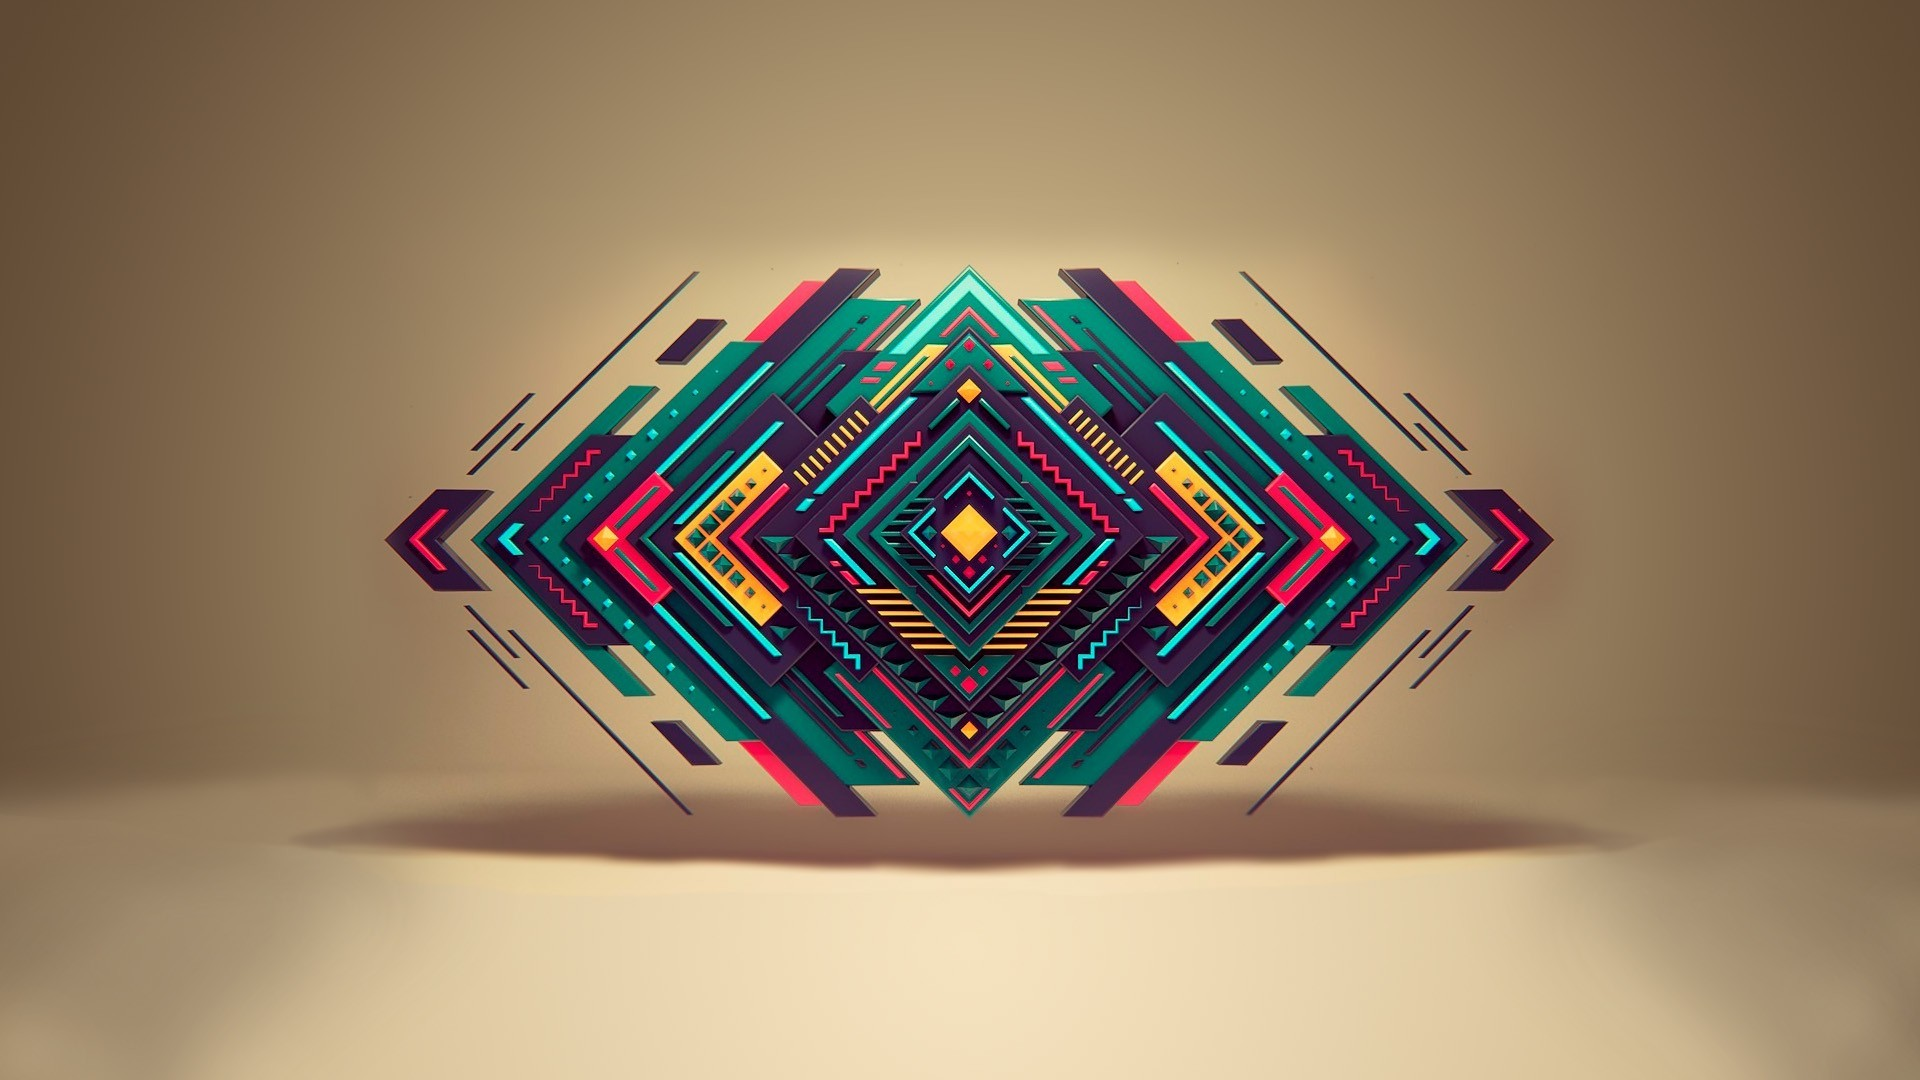 Res: 1920x1080, Abstract Hd Wallpaper 133